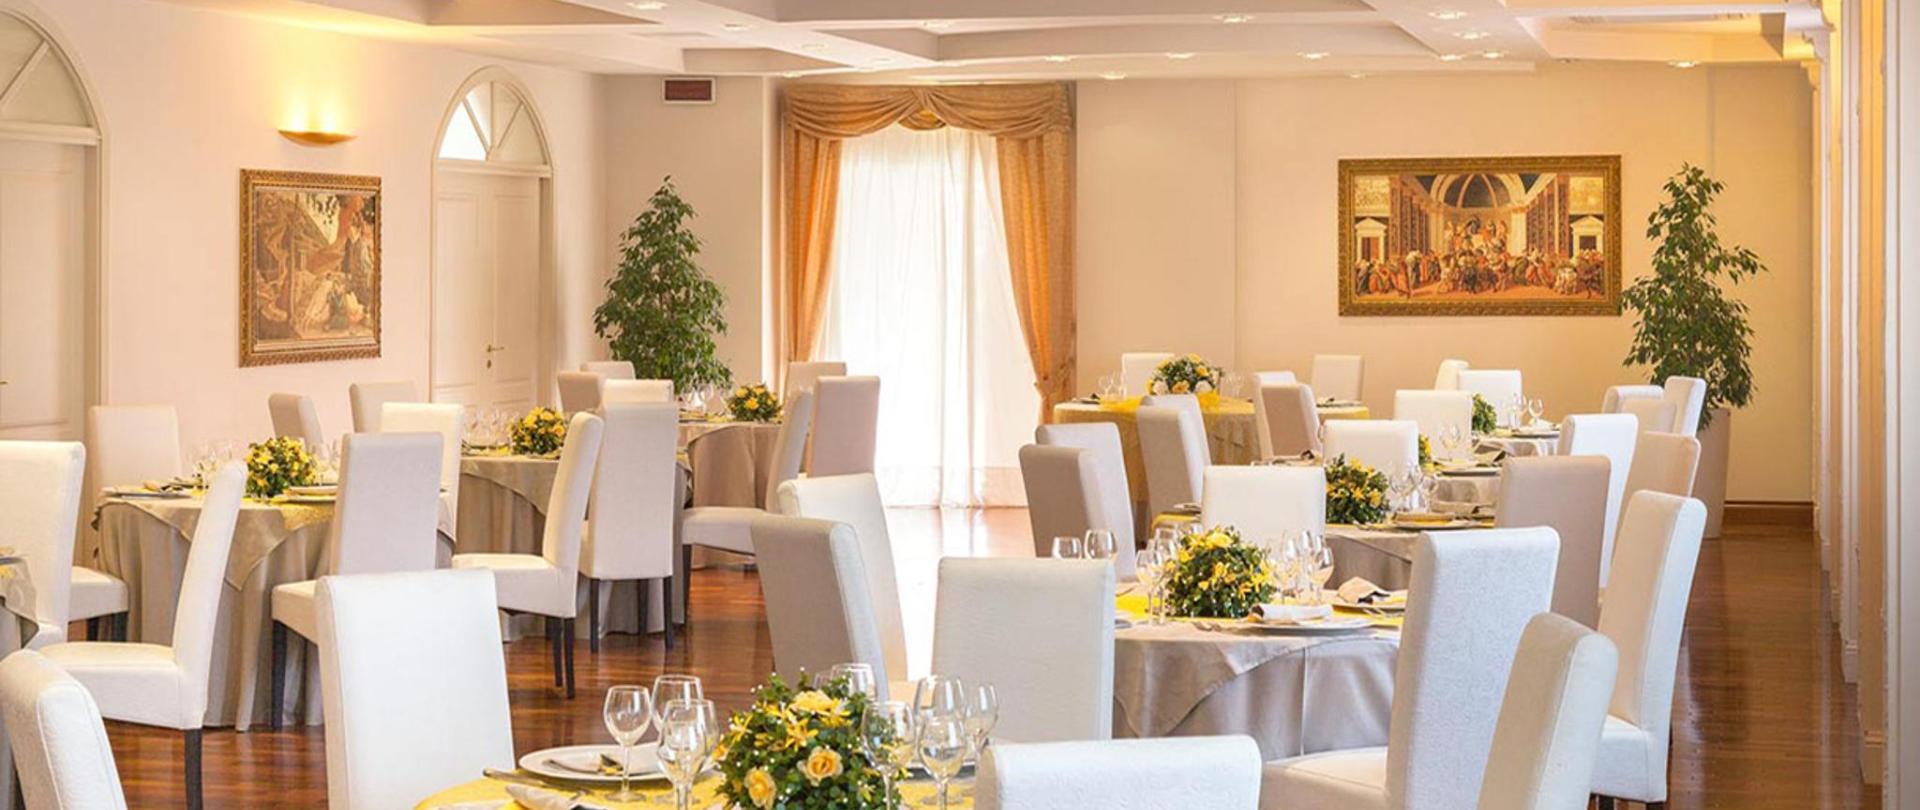 Virginia_Palace_Hotel_Spa_Centro_Benessere_Sala_cerimonia_Campania_Avellino_2.jpg